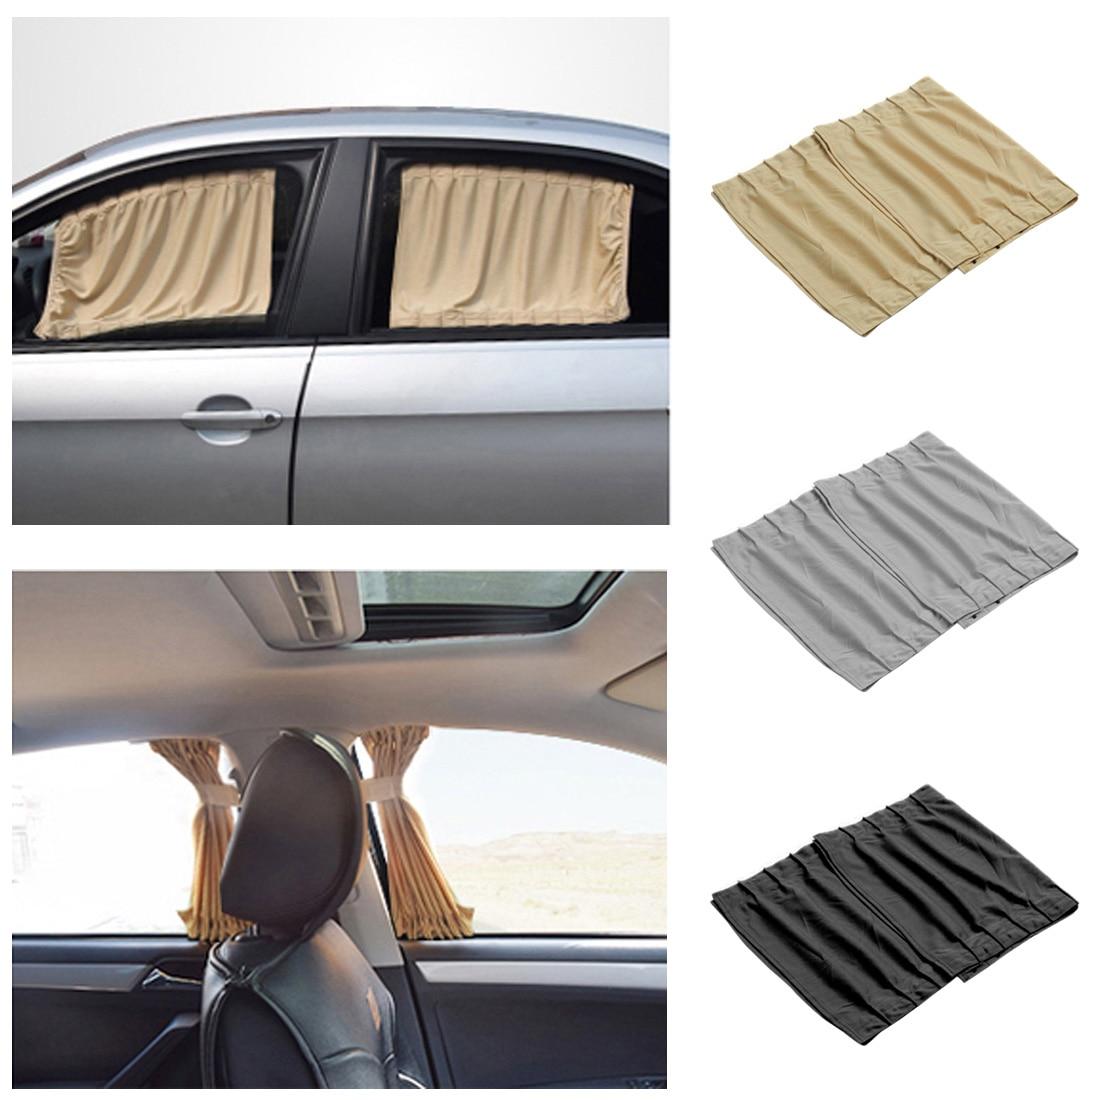 2018 Auto Window frames Sun protection visor blinds cover Aluminum alloy car side windows sun protection shades 2 pieces / set.